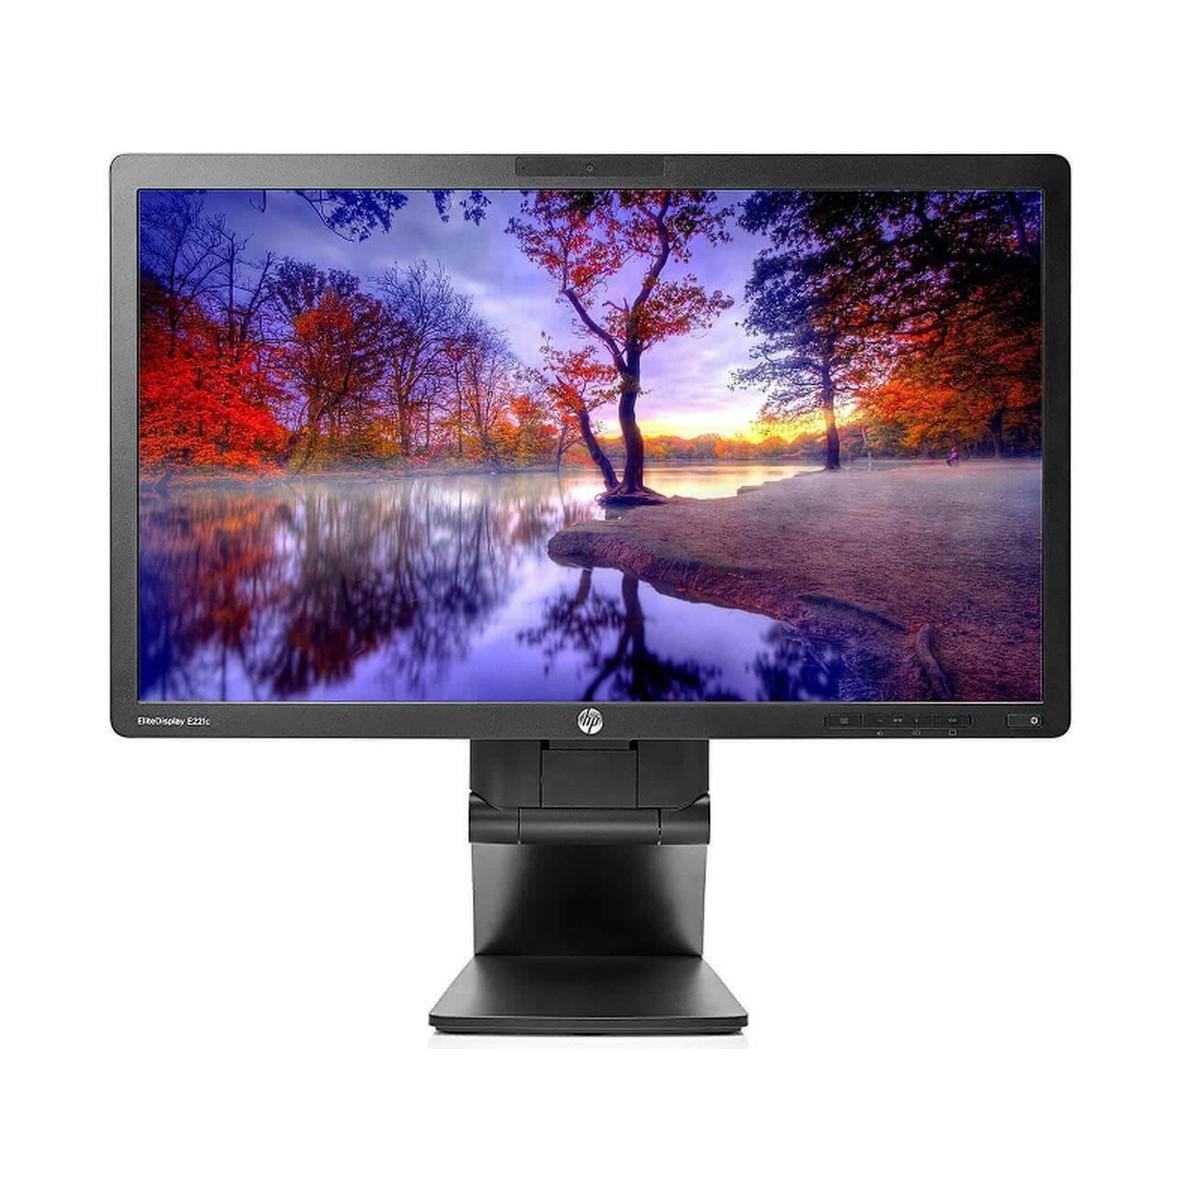 MONITOR HP E221c 21,5' IPS LED FULL HD KAMERA KL.A